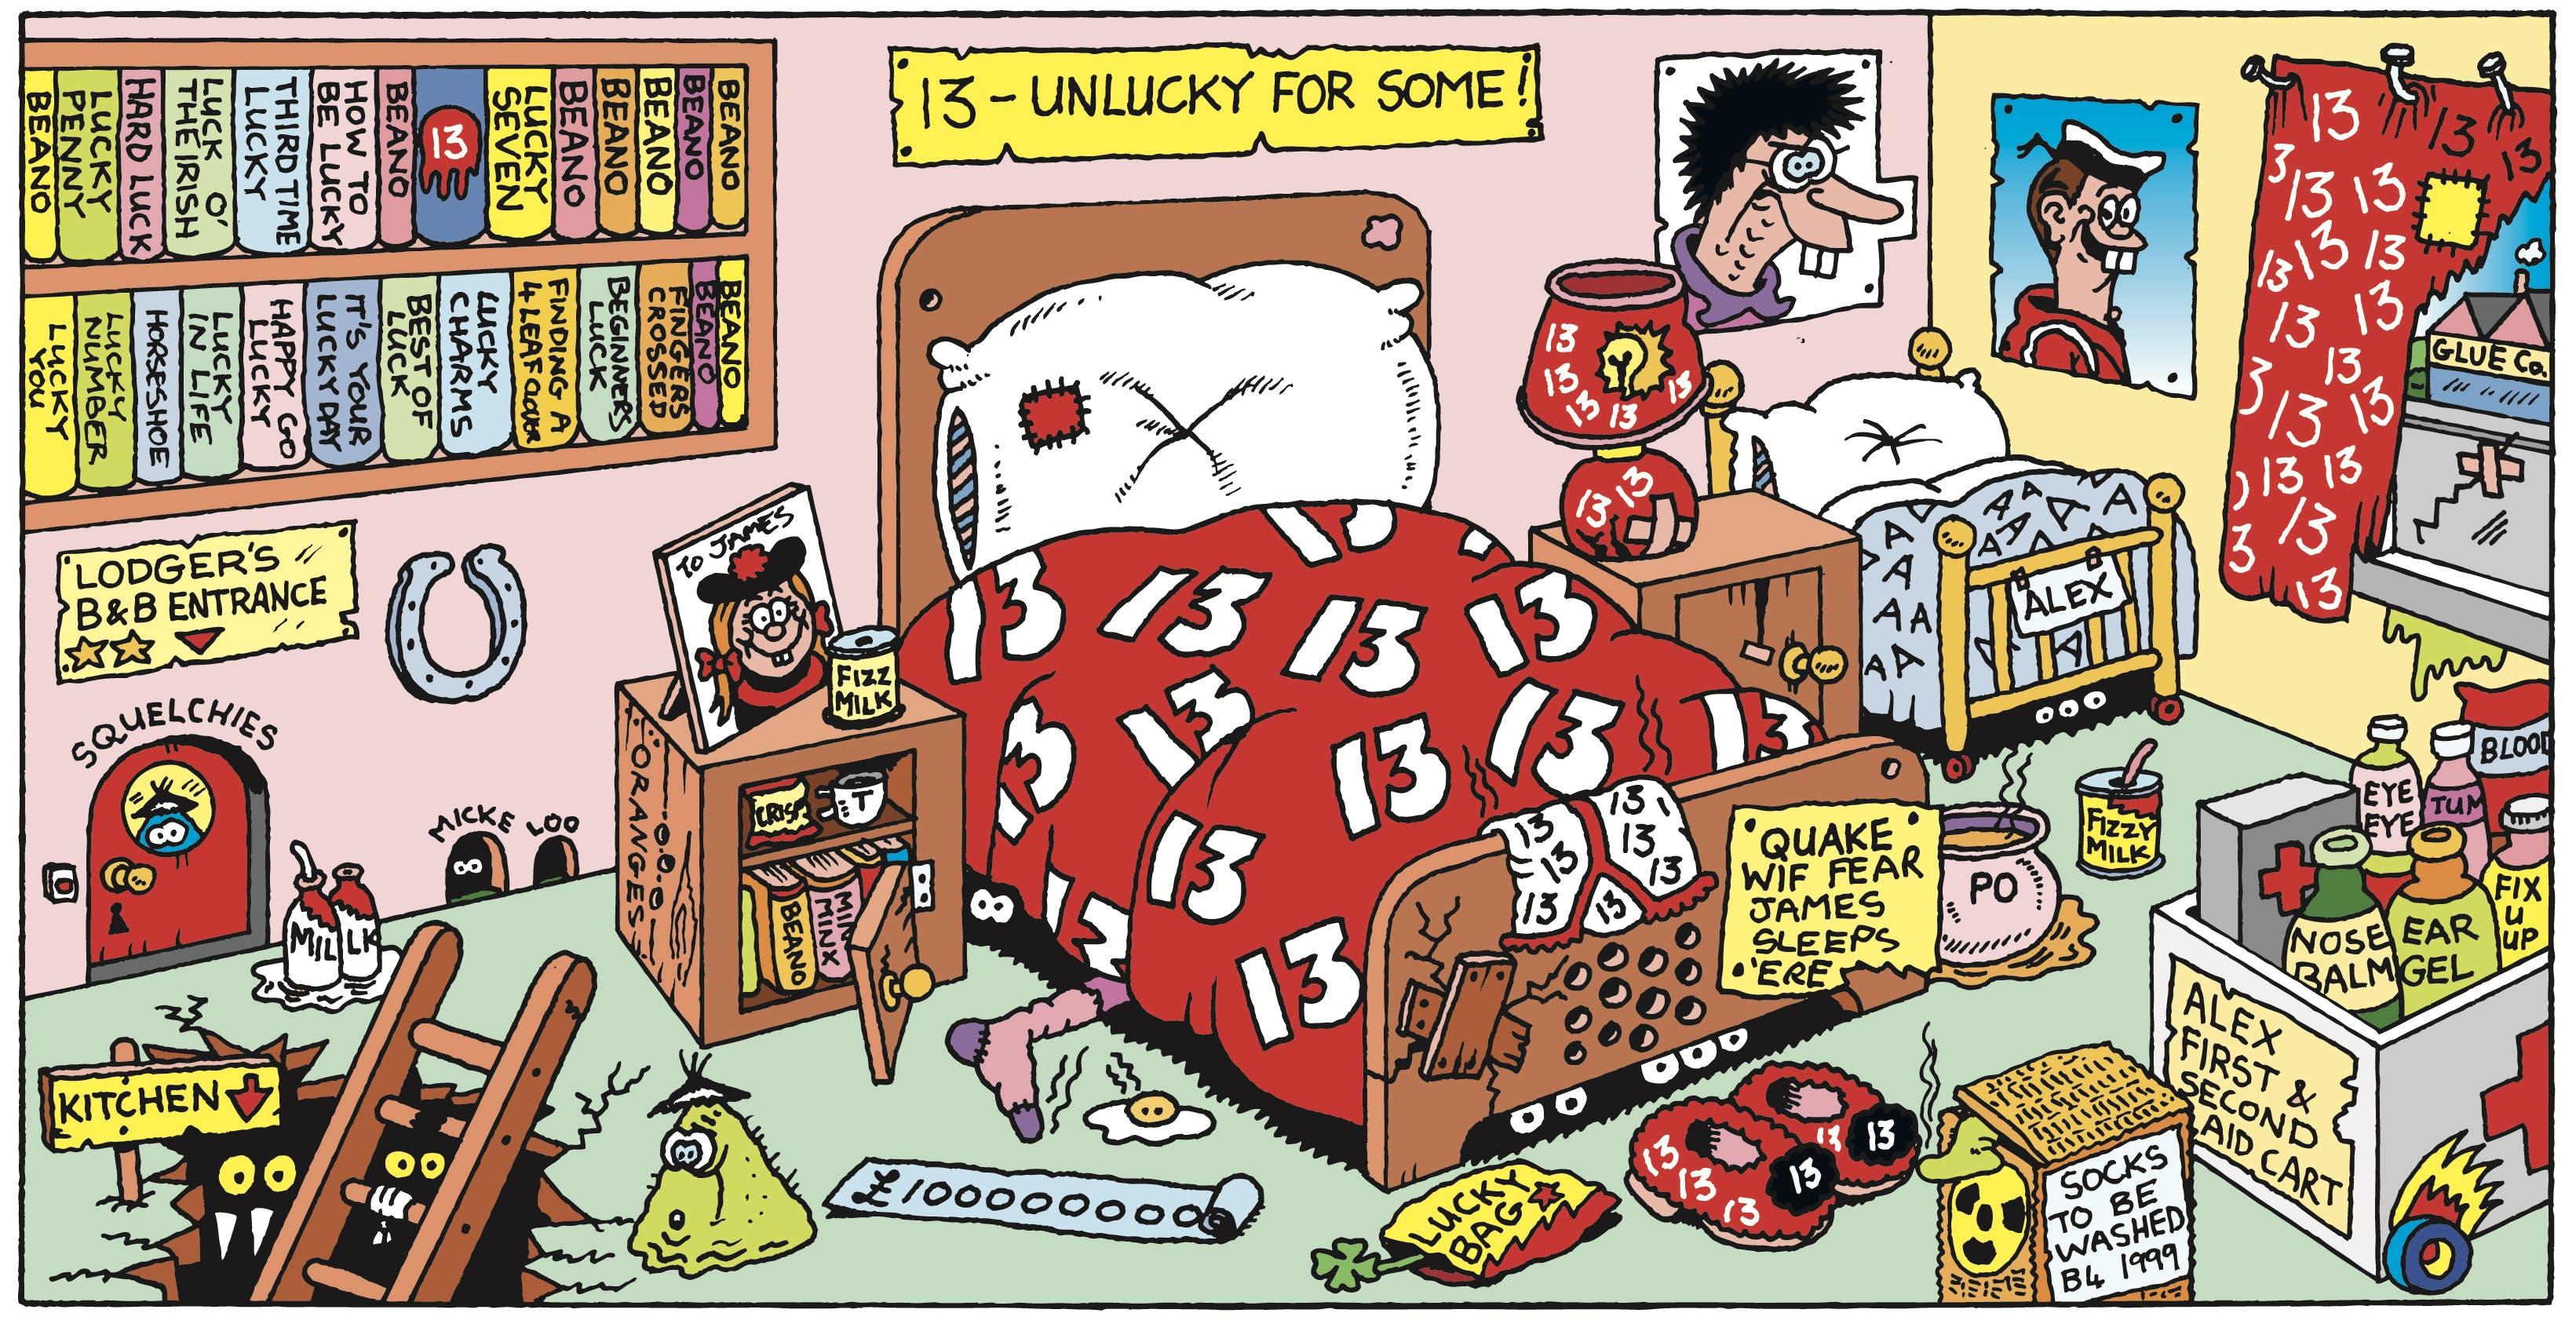 the Unluckiest Bedroom in the World!